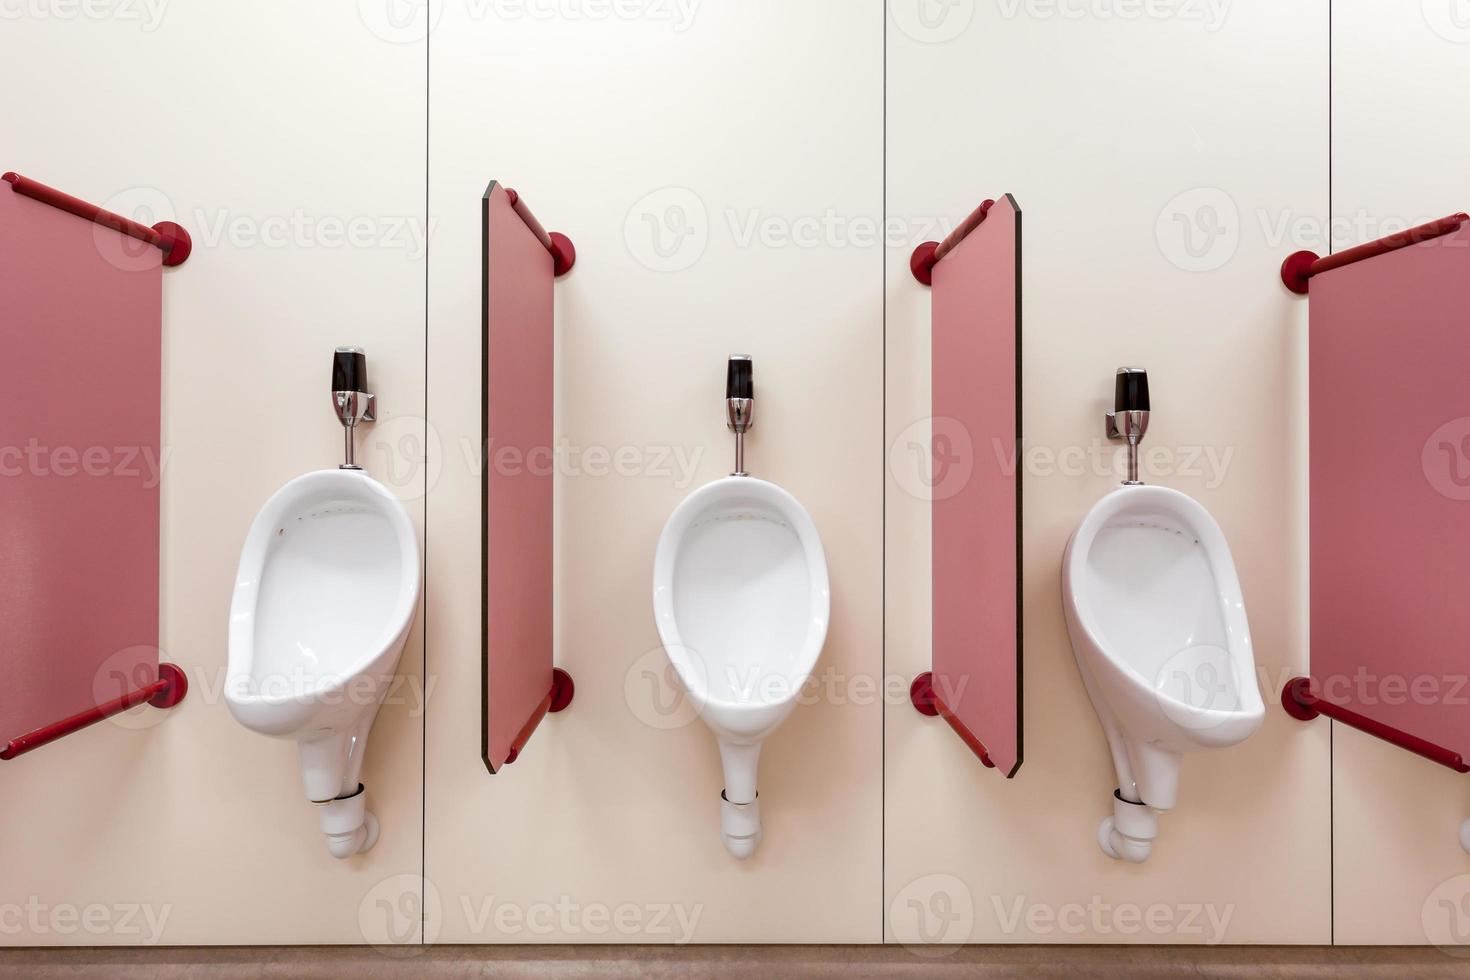 urinoir foto